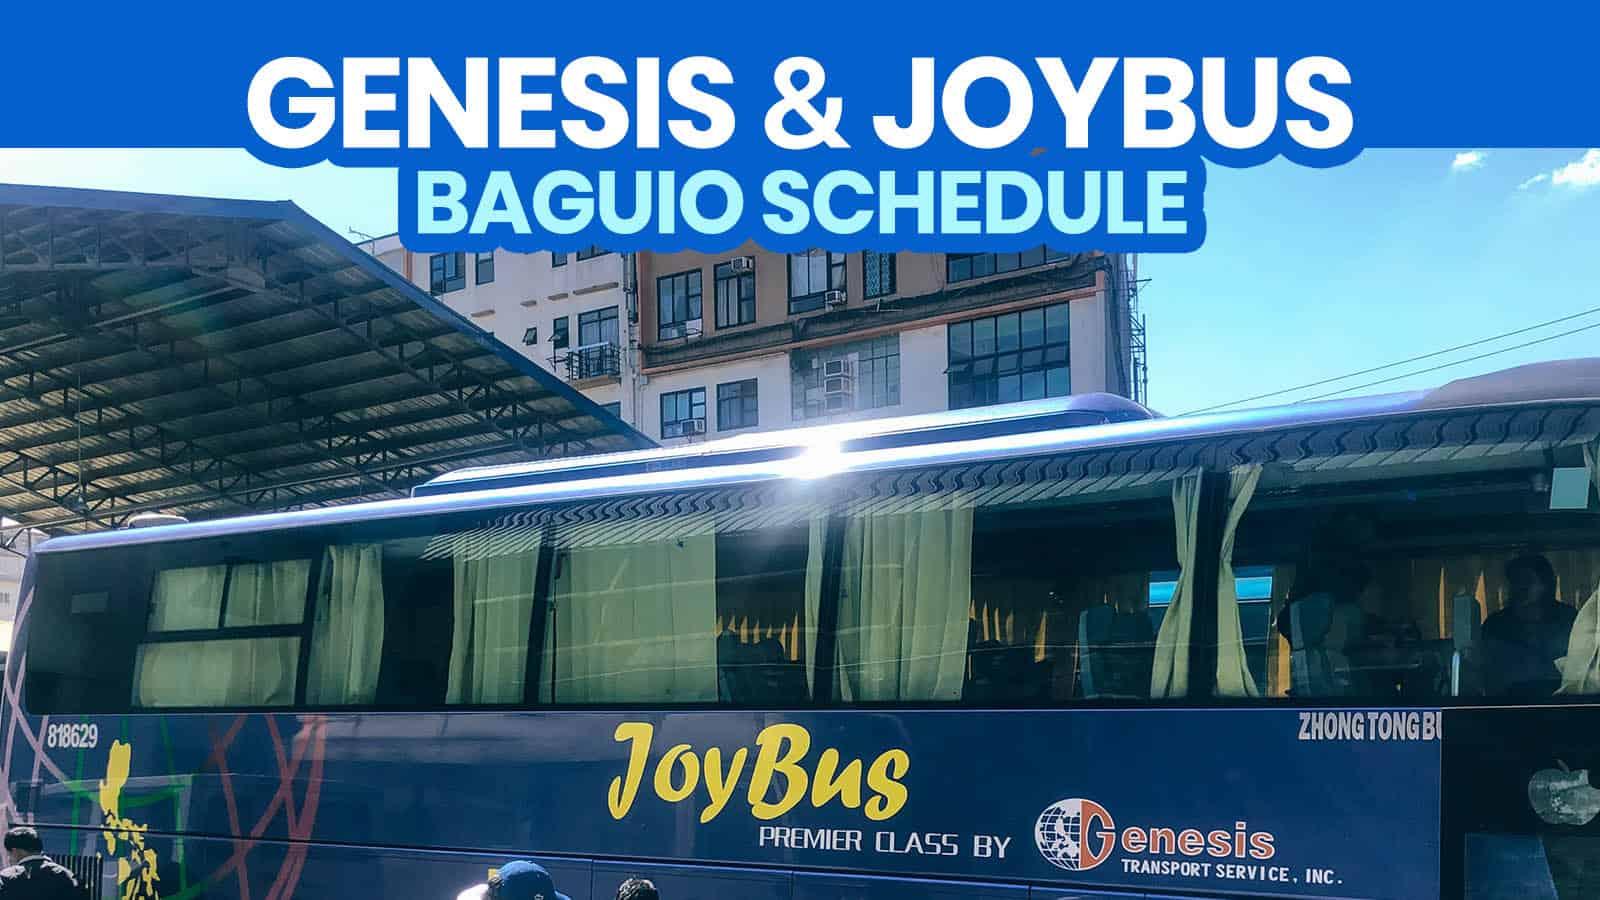 GENESIS TRANSPORT & JOY BUS SCHEDULE 2021: Cubao to Baguio / Baguio to Cubao